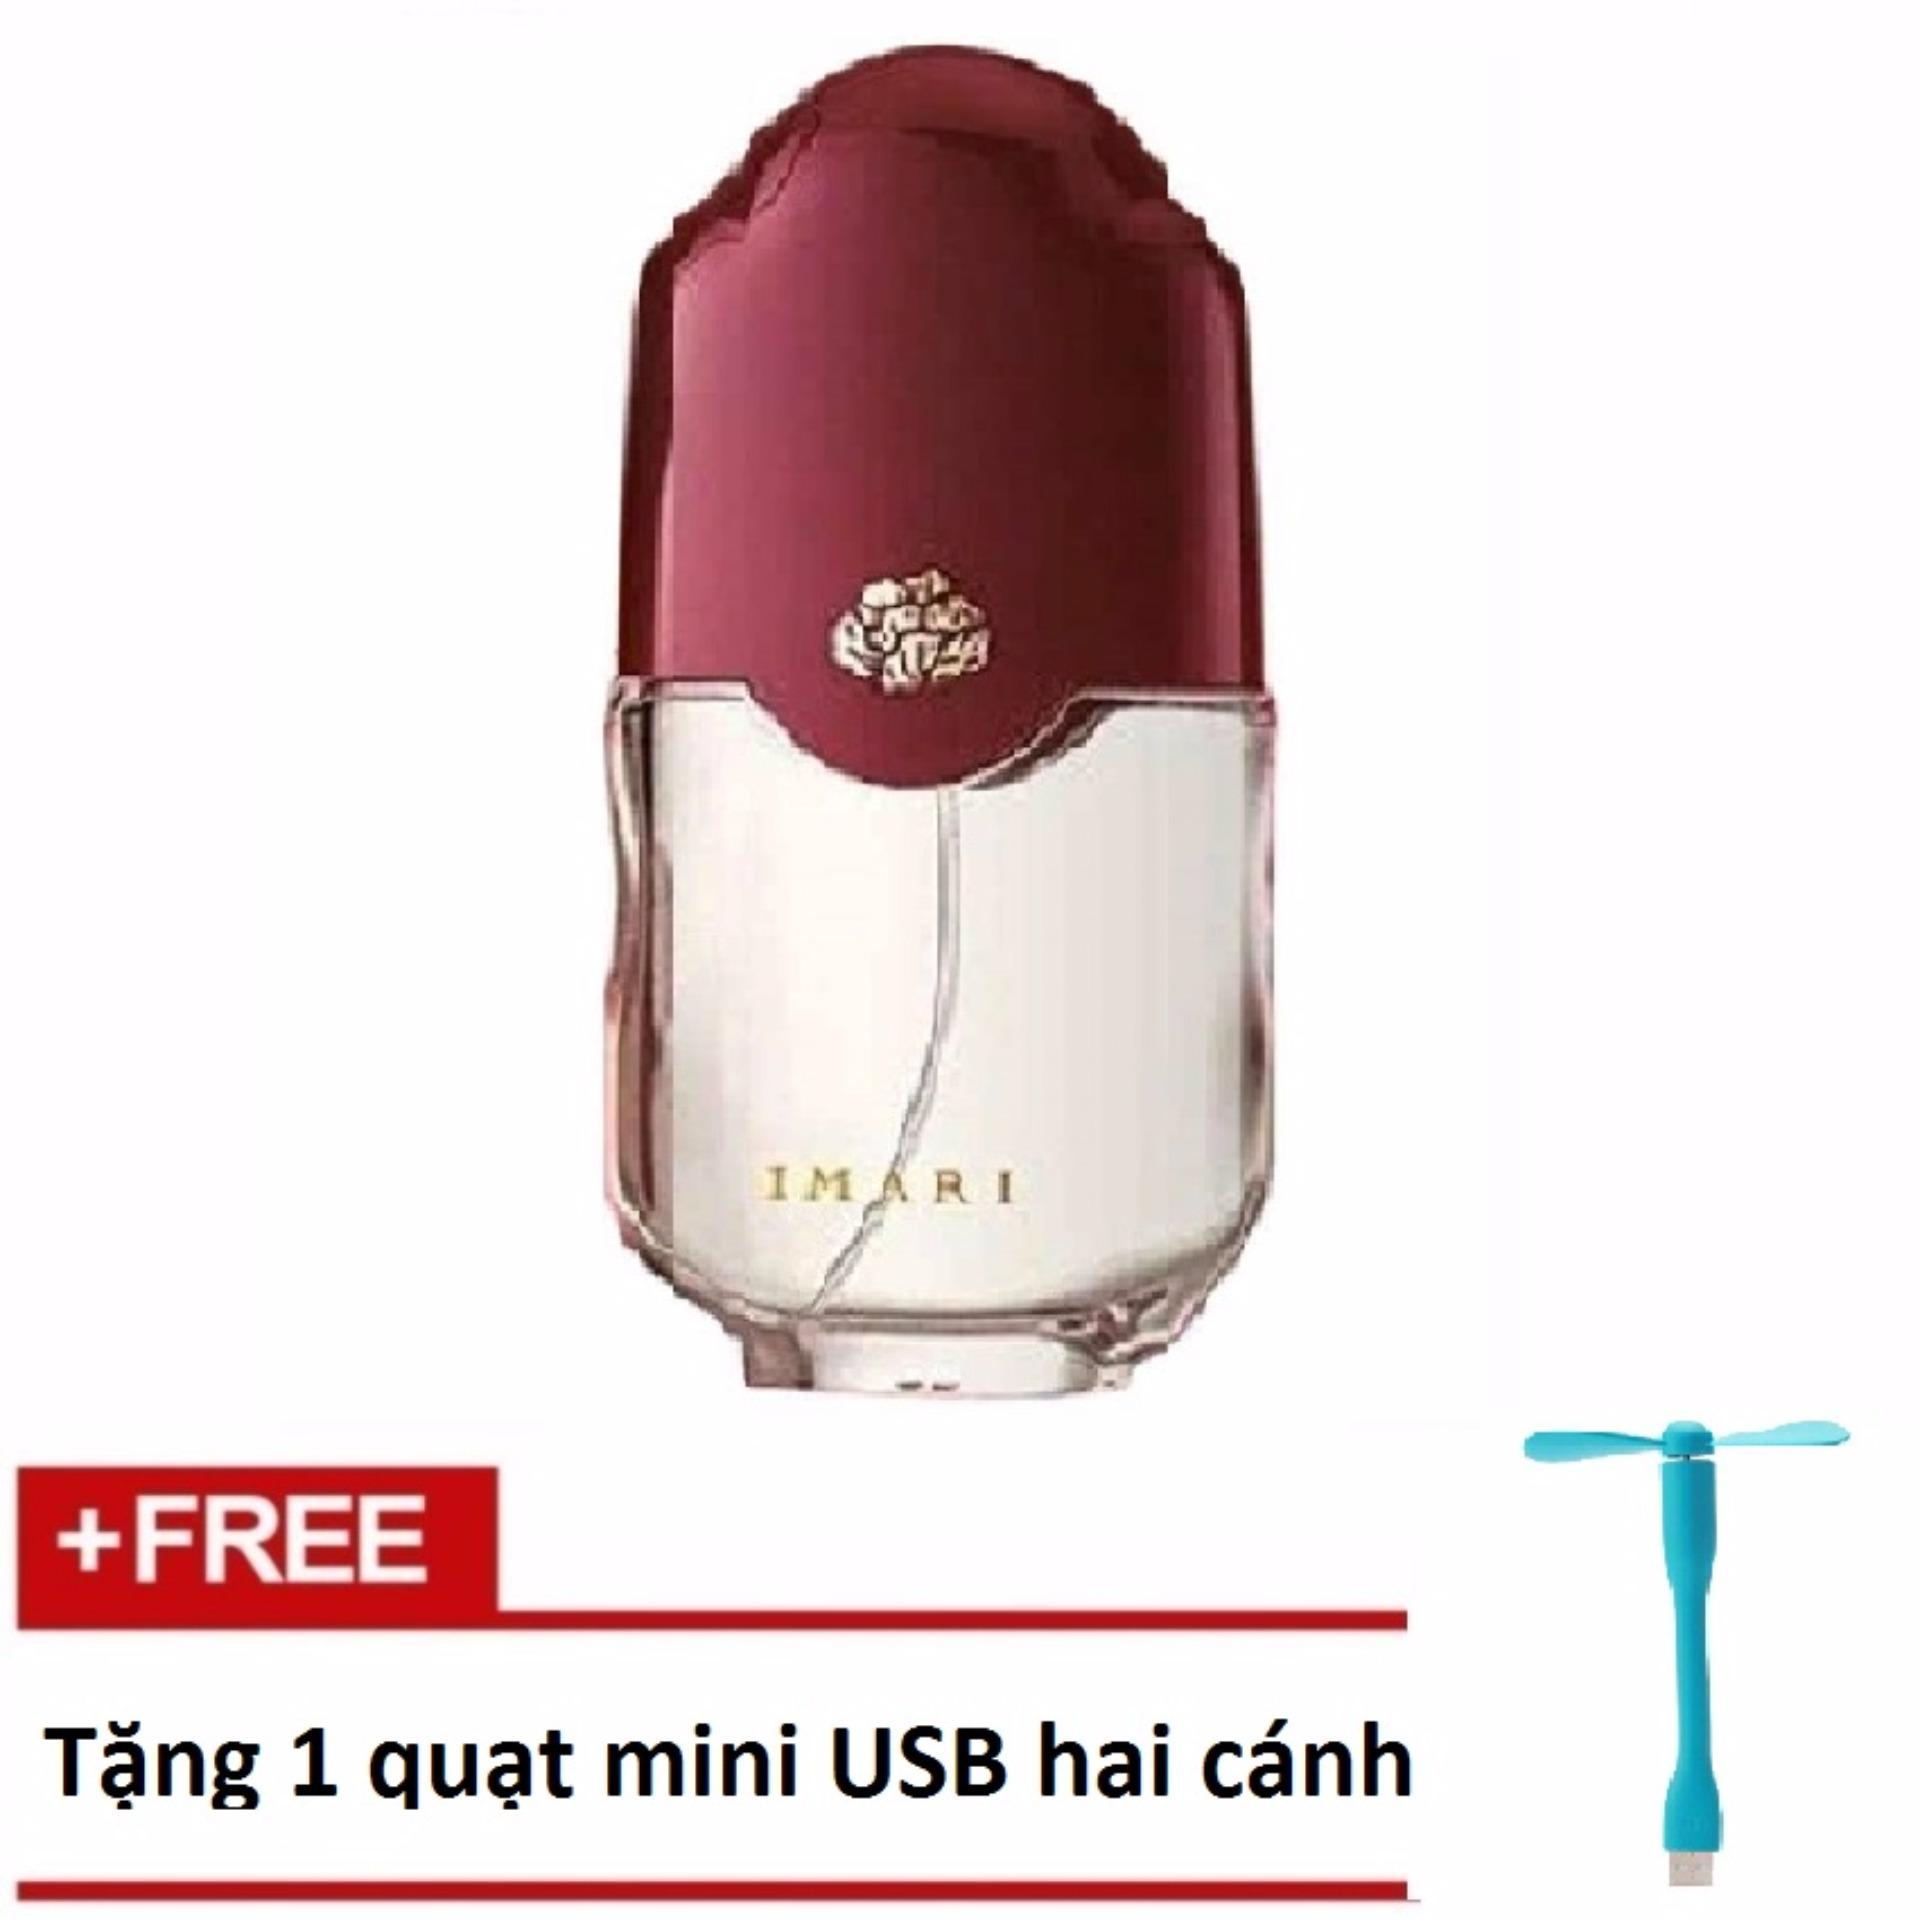 Nước Hoa Nữ Avon Imari Classic 50ml + Tặng 1 quạt mini USB hai cánh